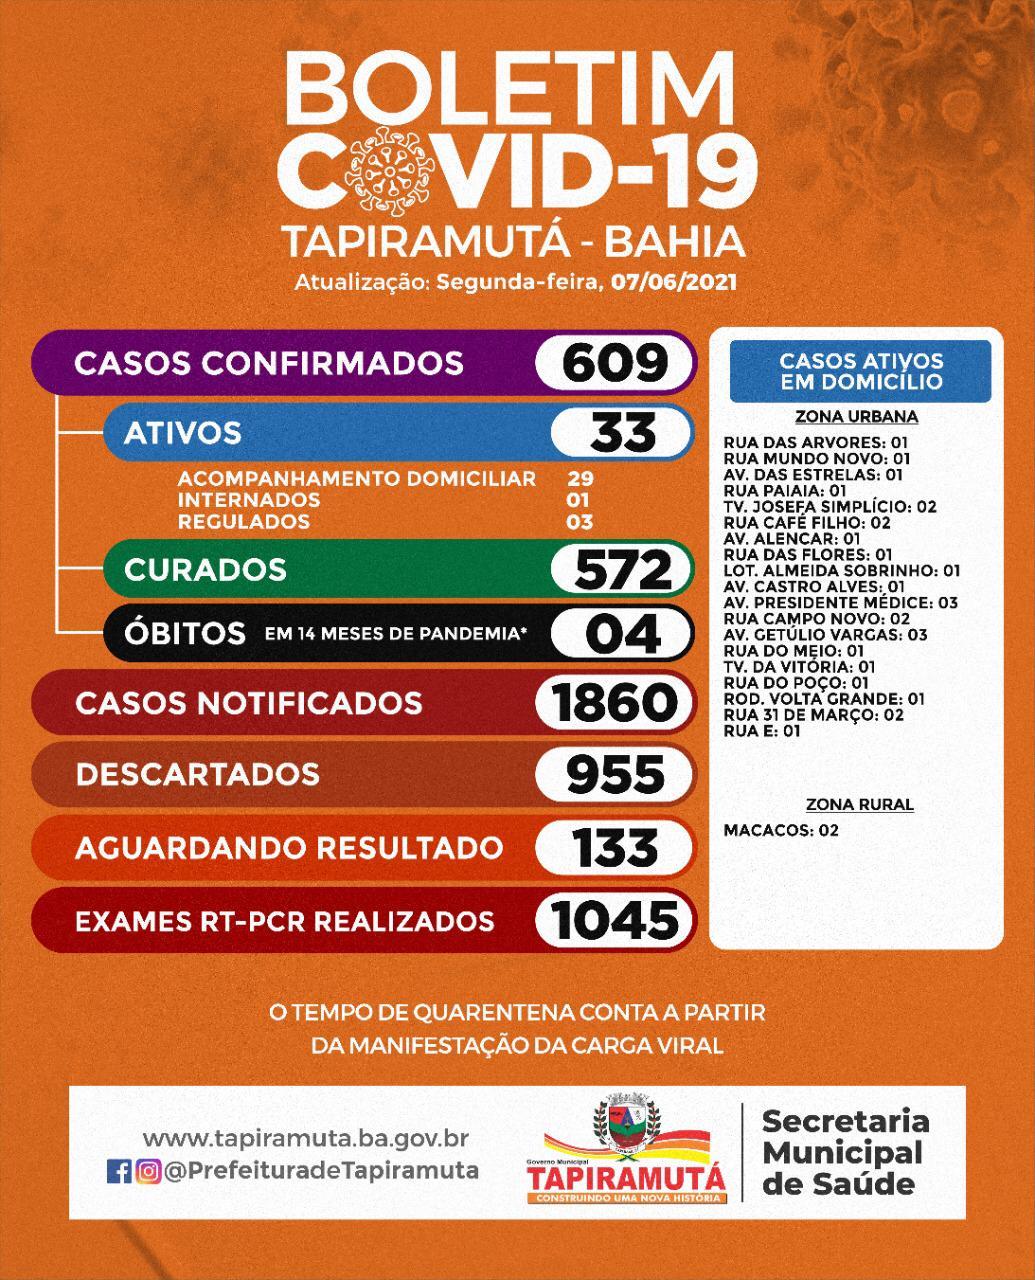 Secretaria de Saúde informa boletim do Coronavírus em Tapiramutá